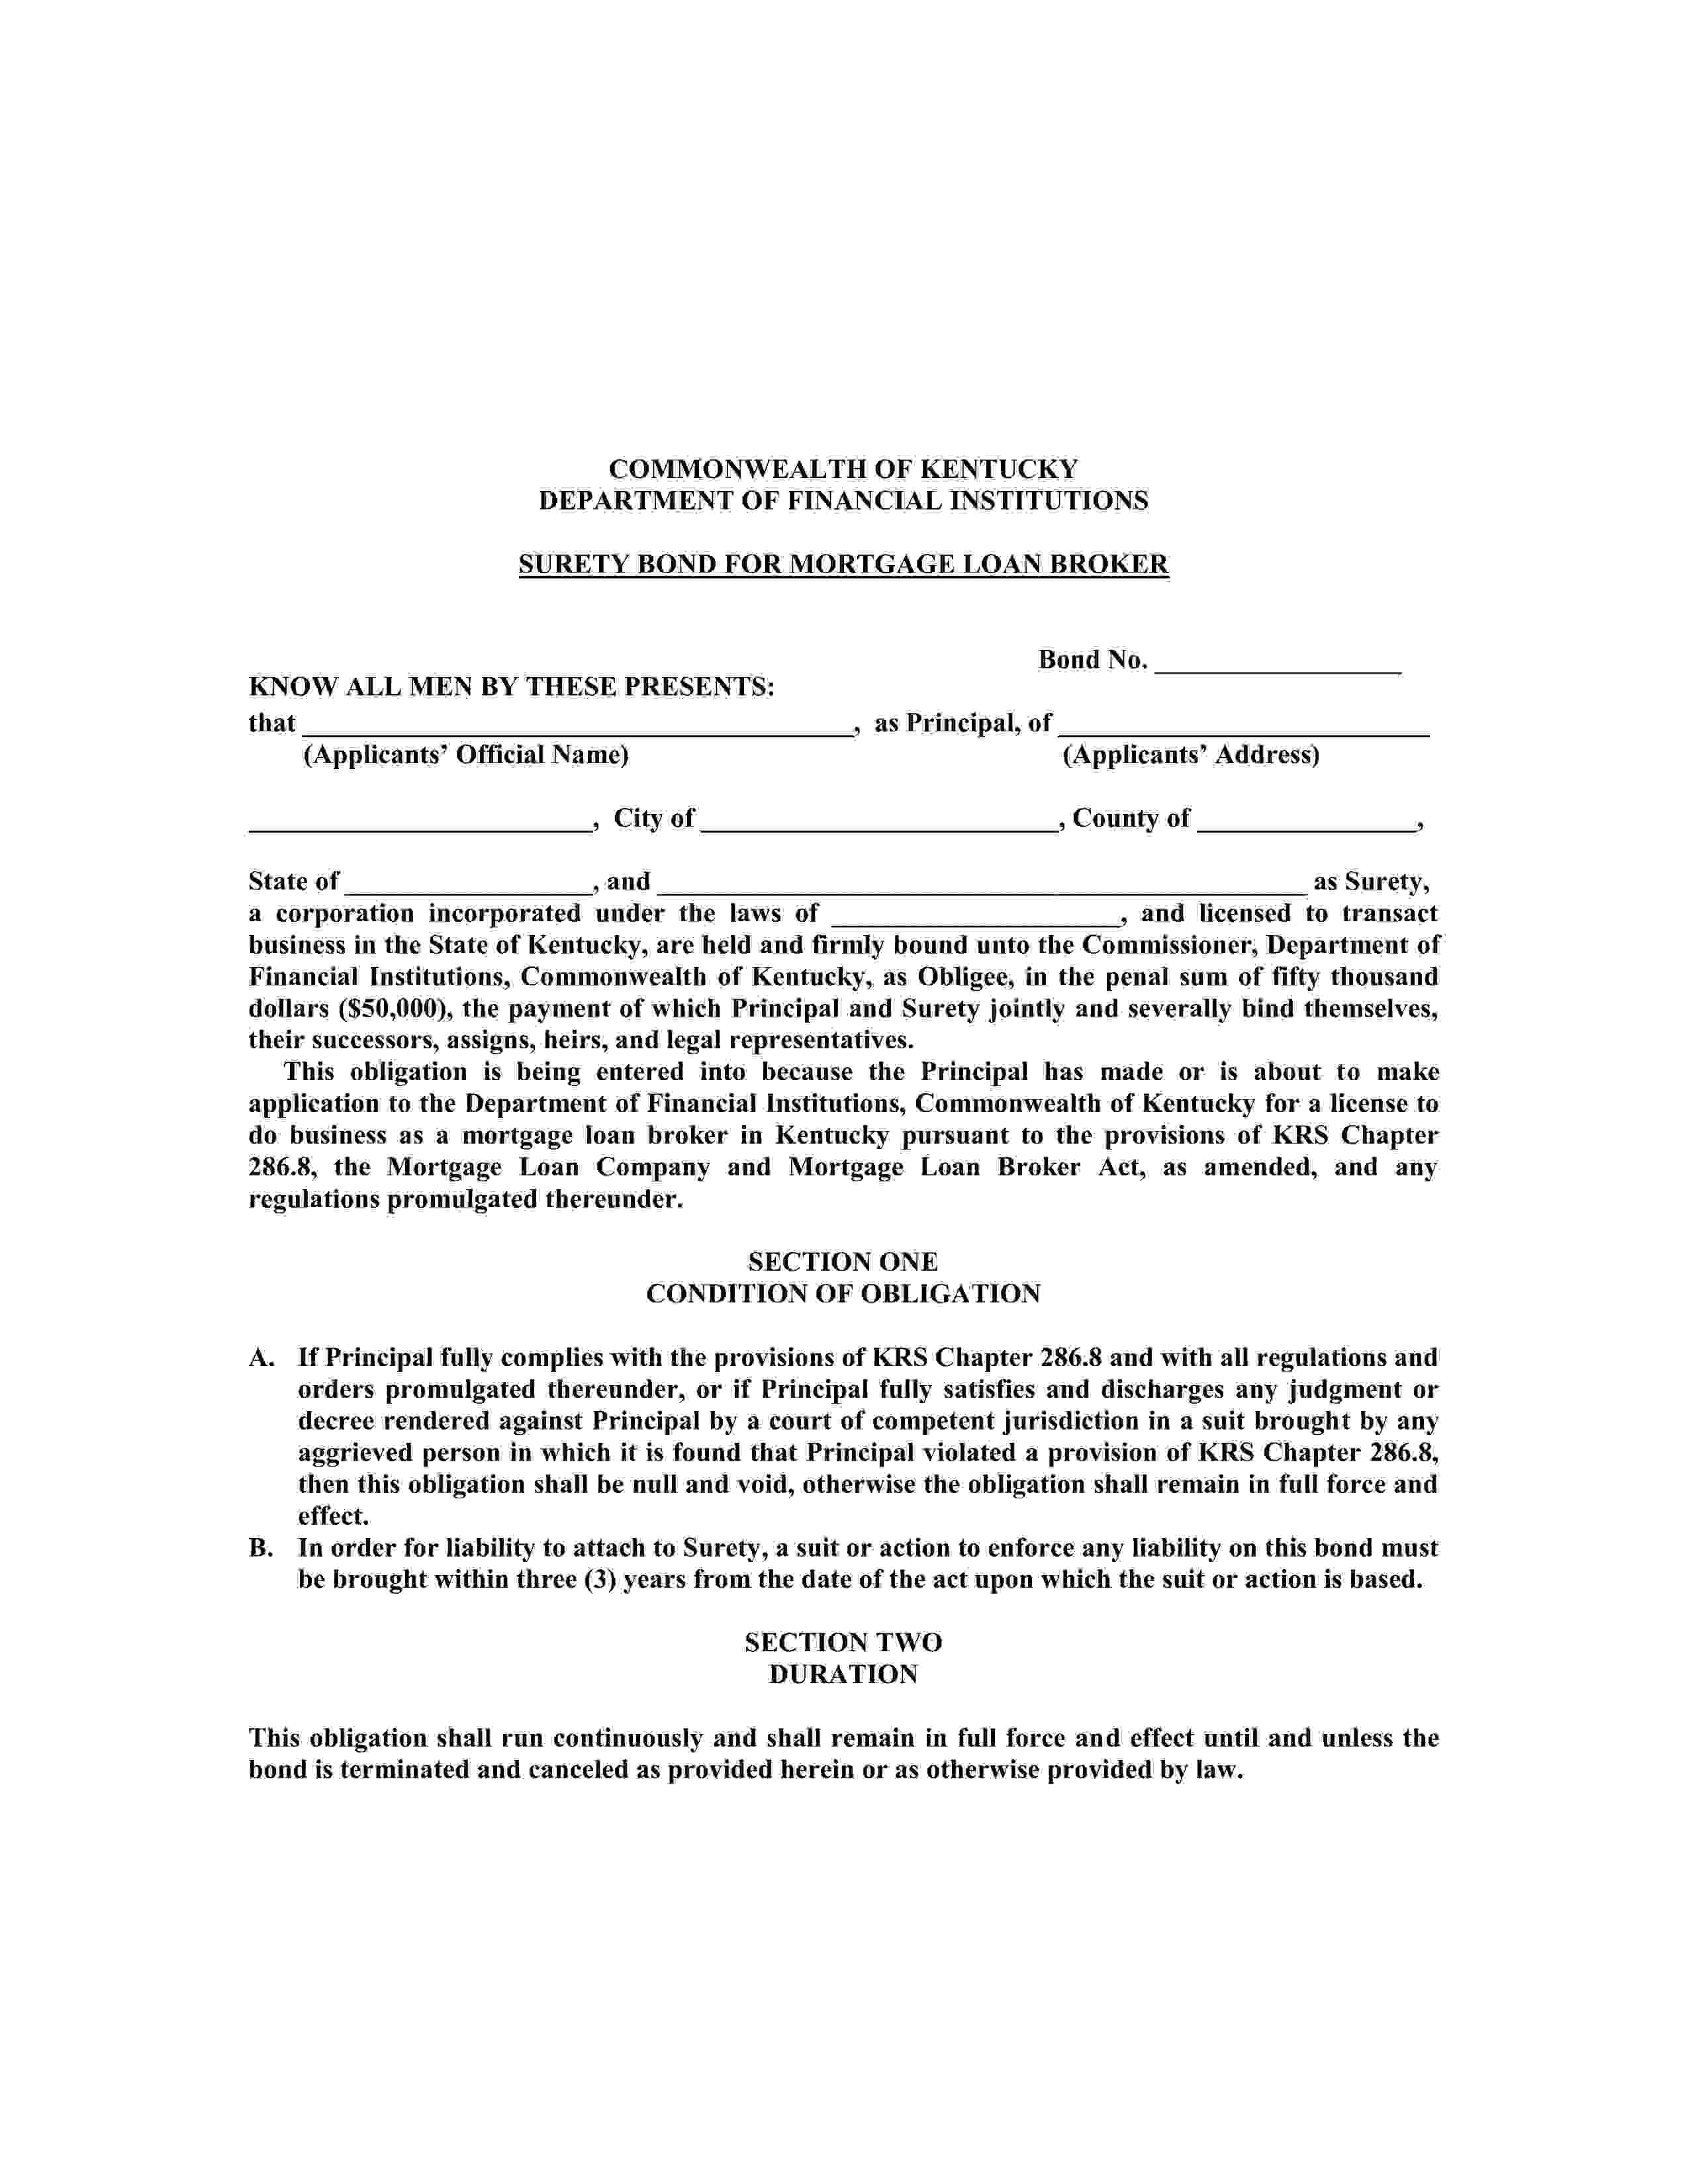 Commonwealth of Kentucky Mortgage Loan Broker sample image